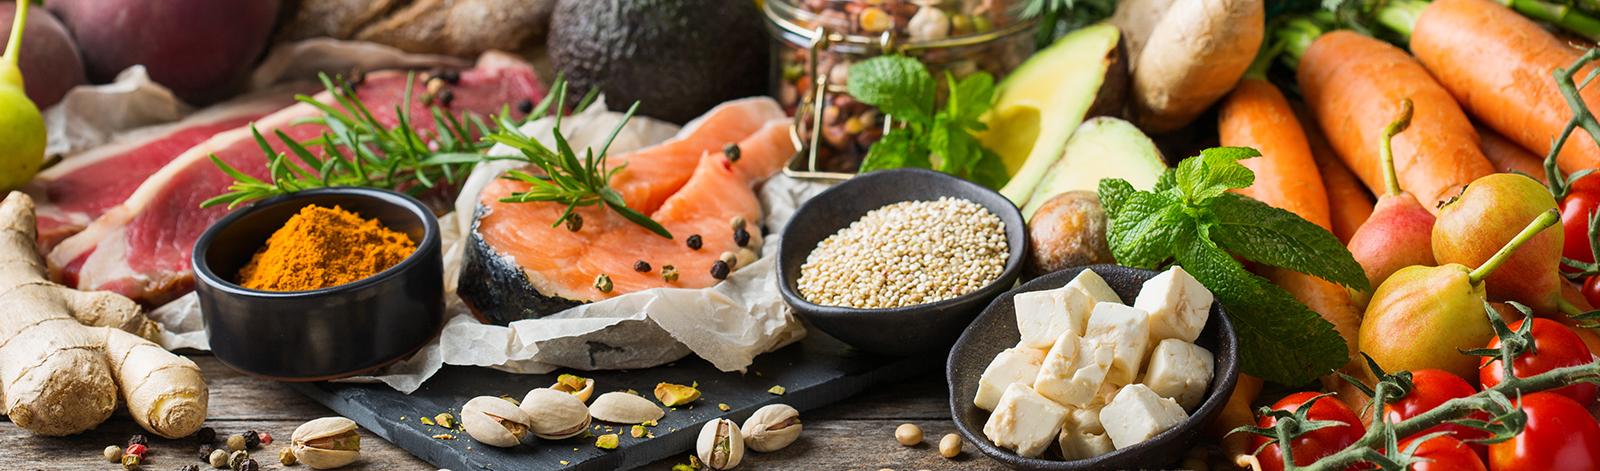 Healthy food for balanced flexitarian diet